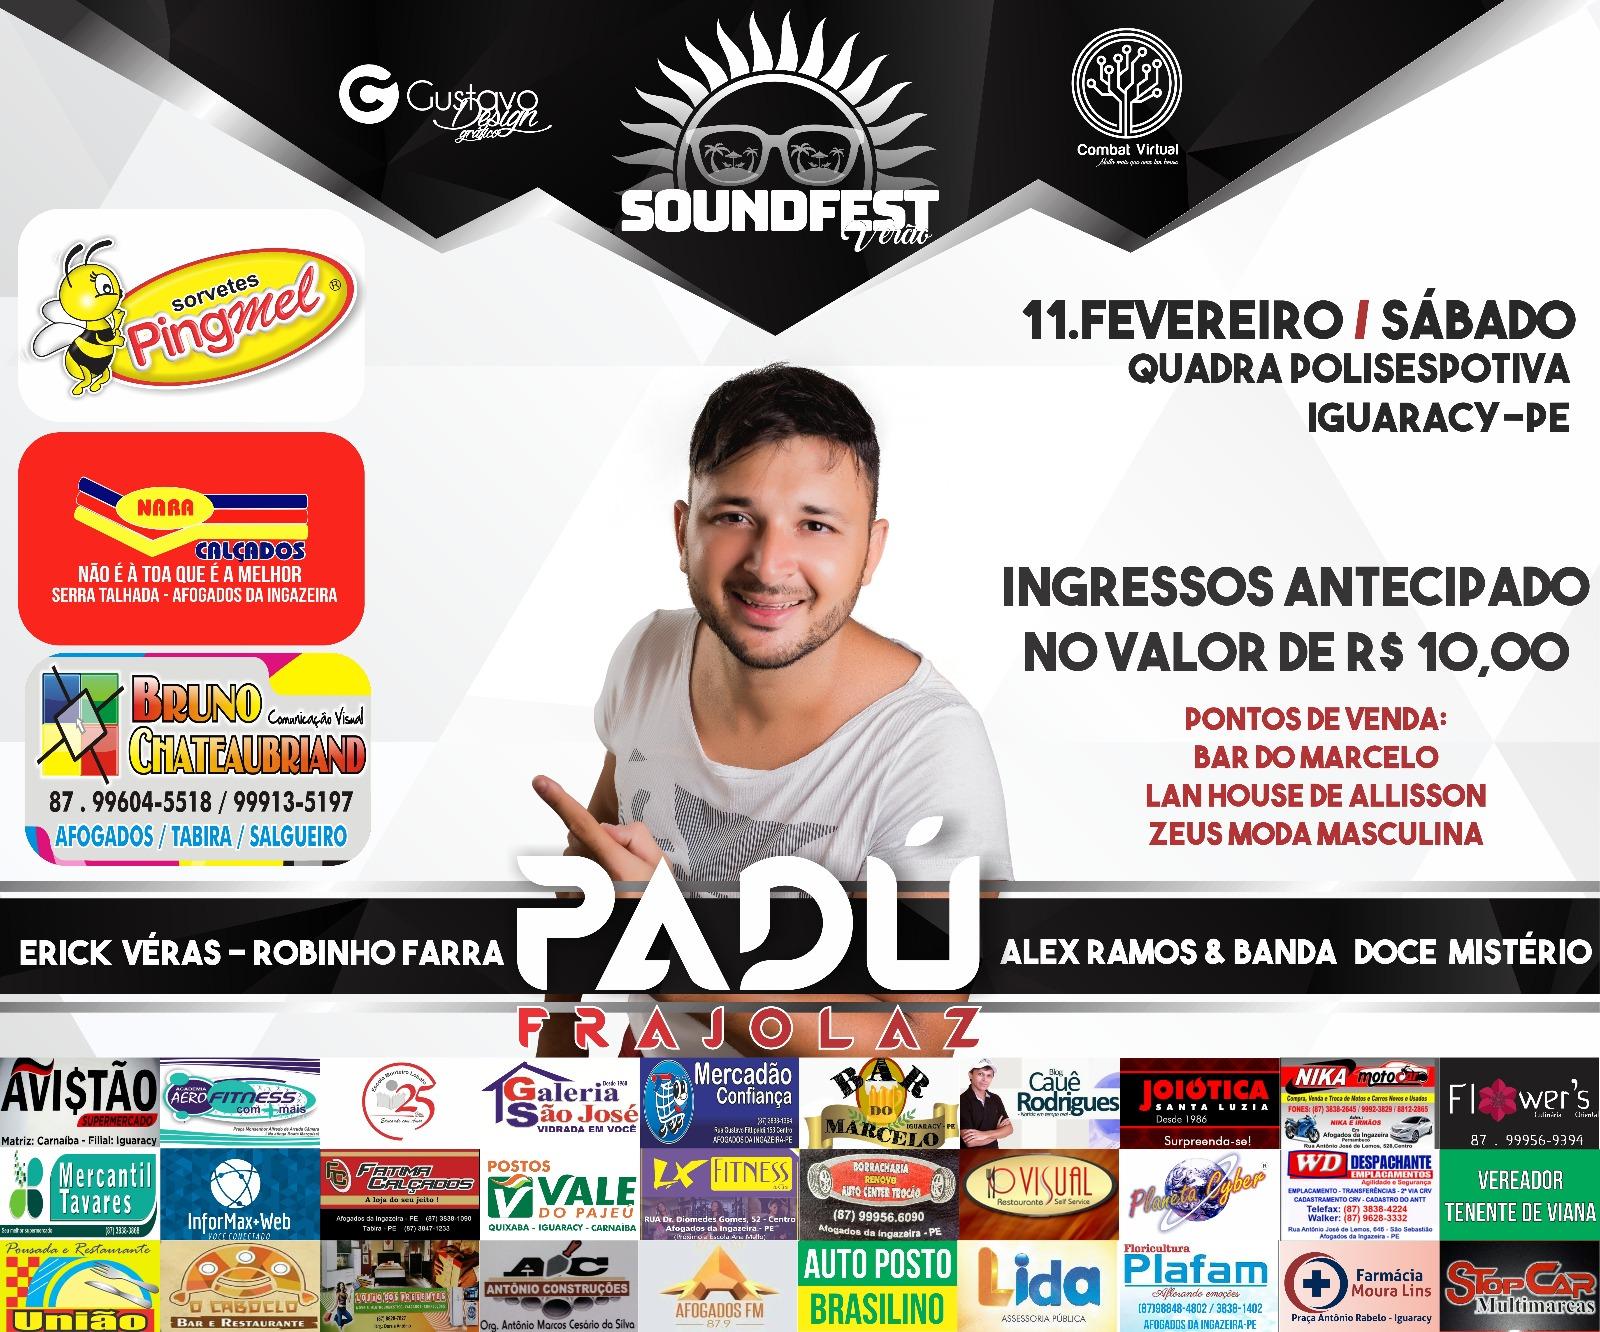 Sound Fest Iguaracy